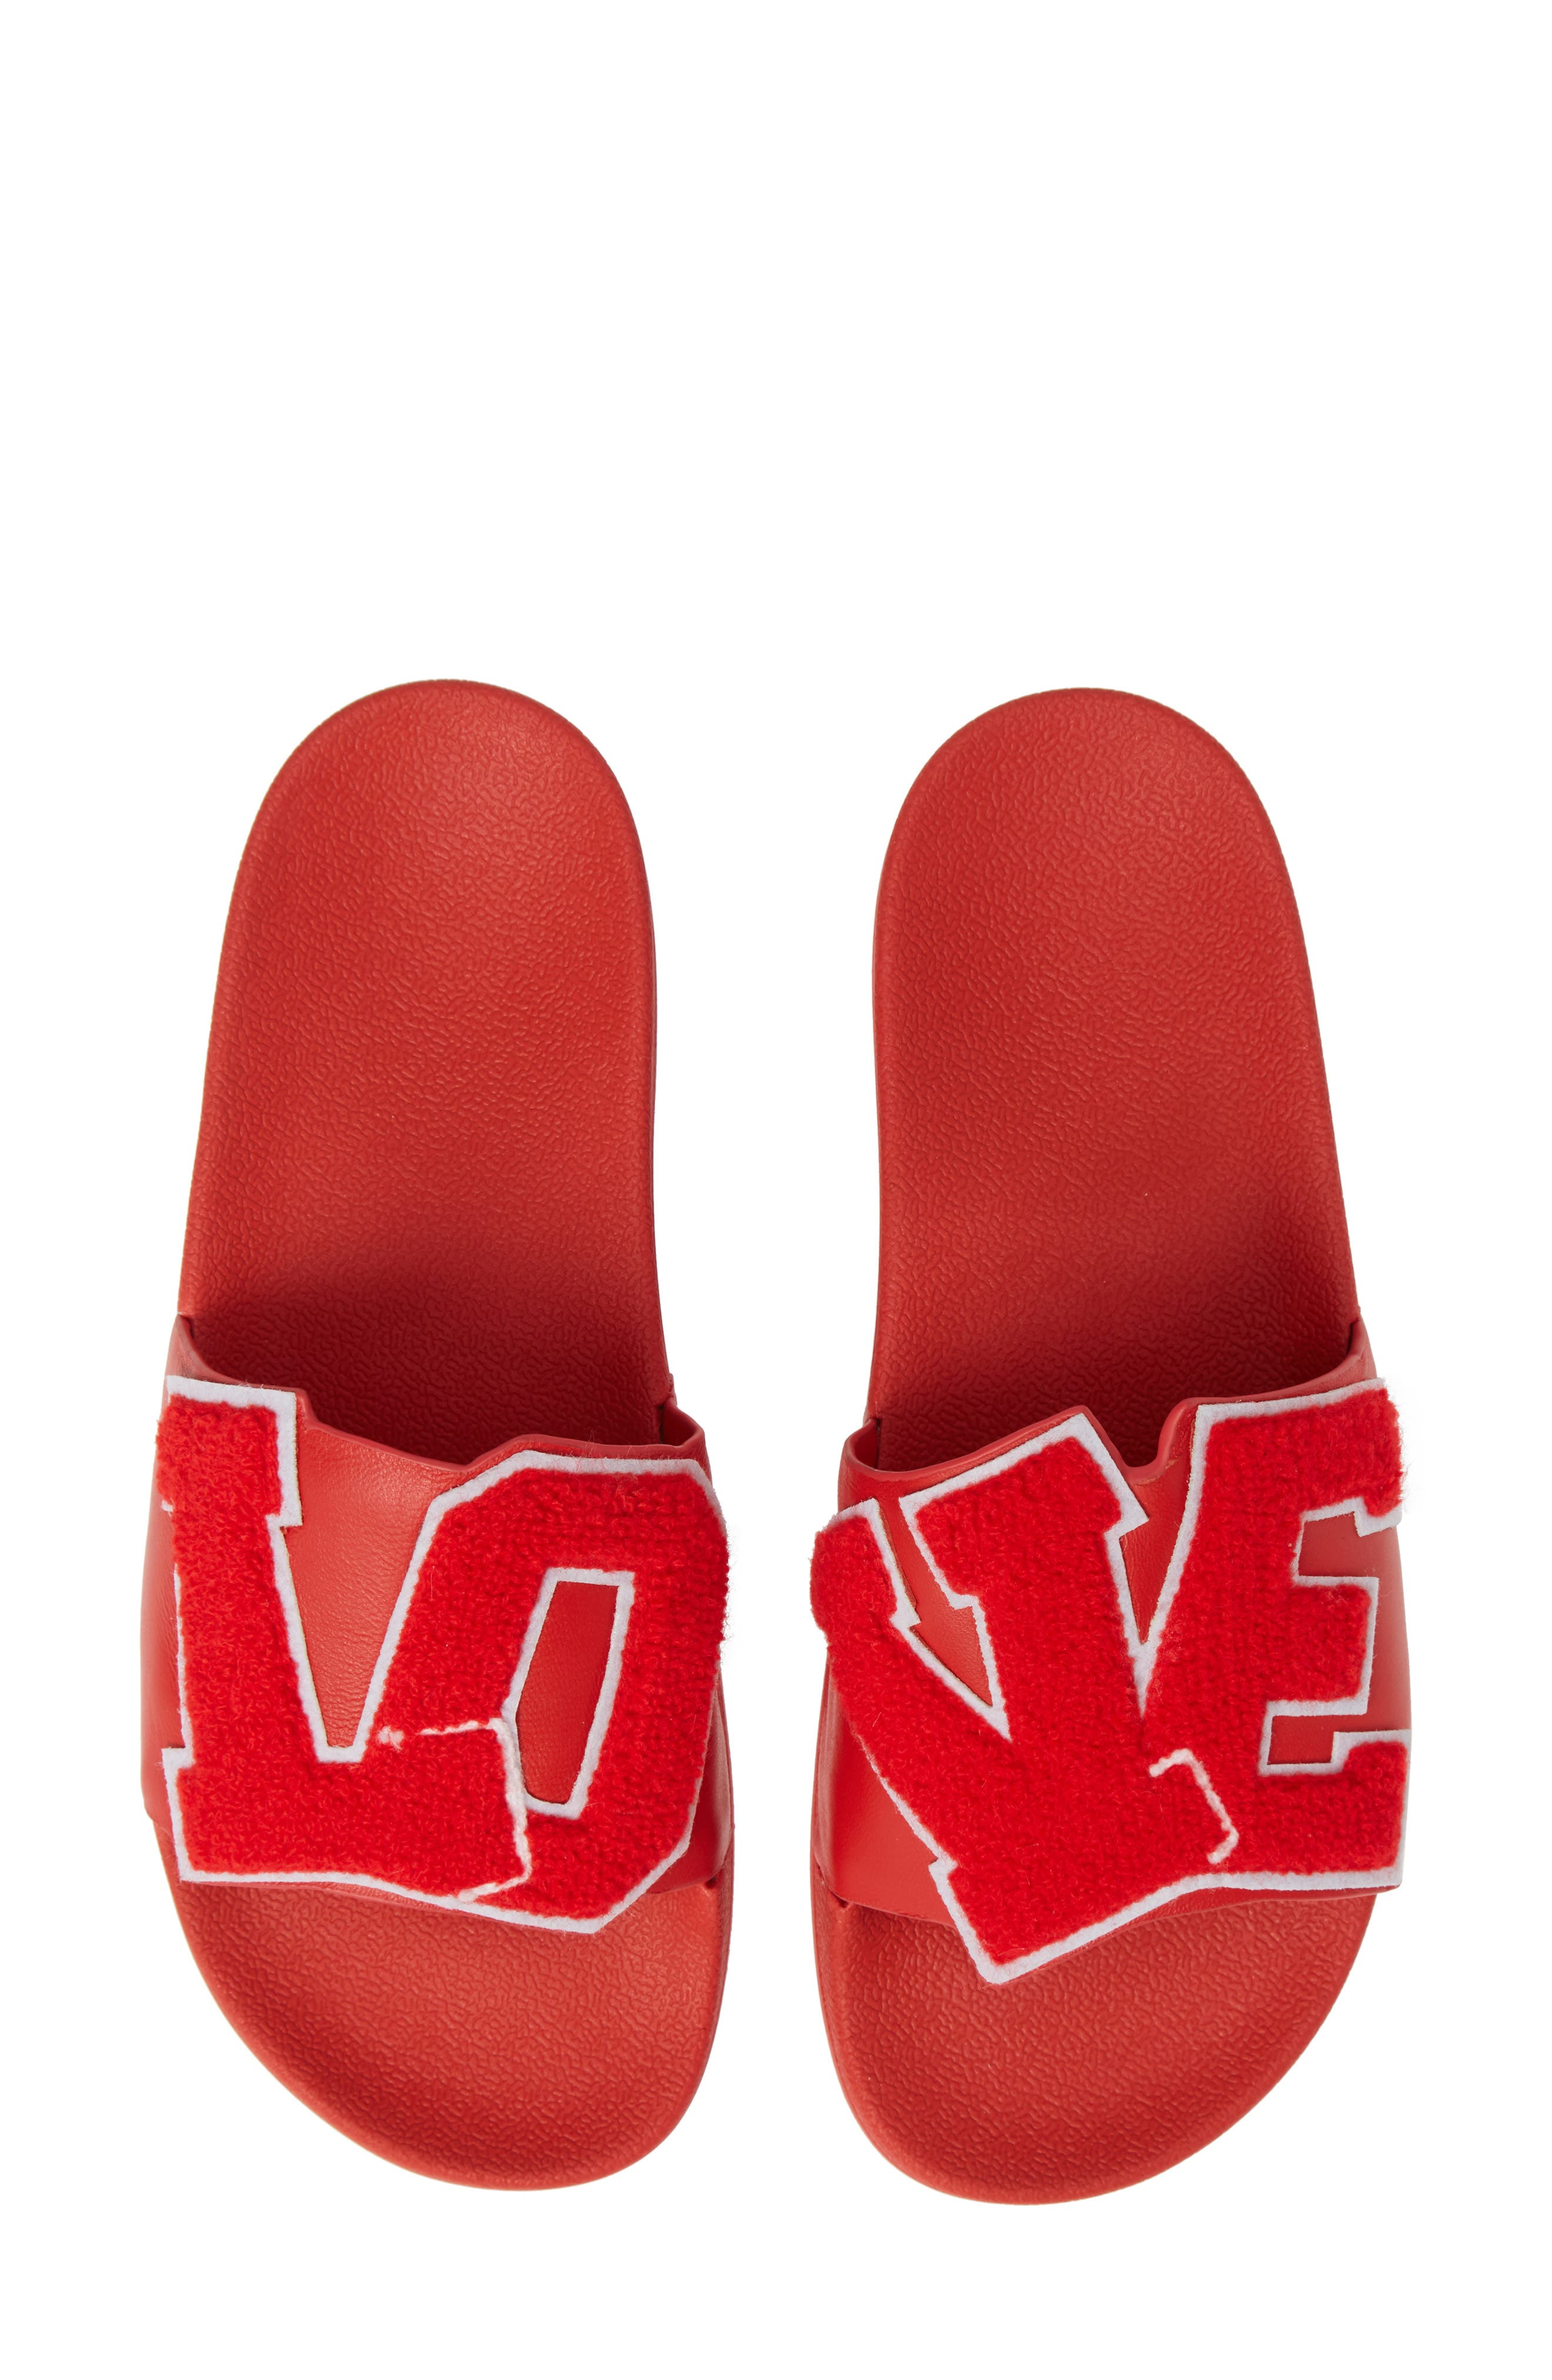 Love Slide Sandal, Main, color, 600